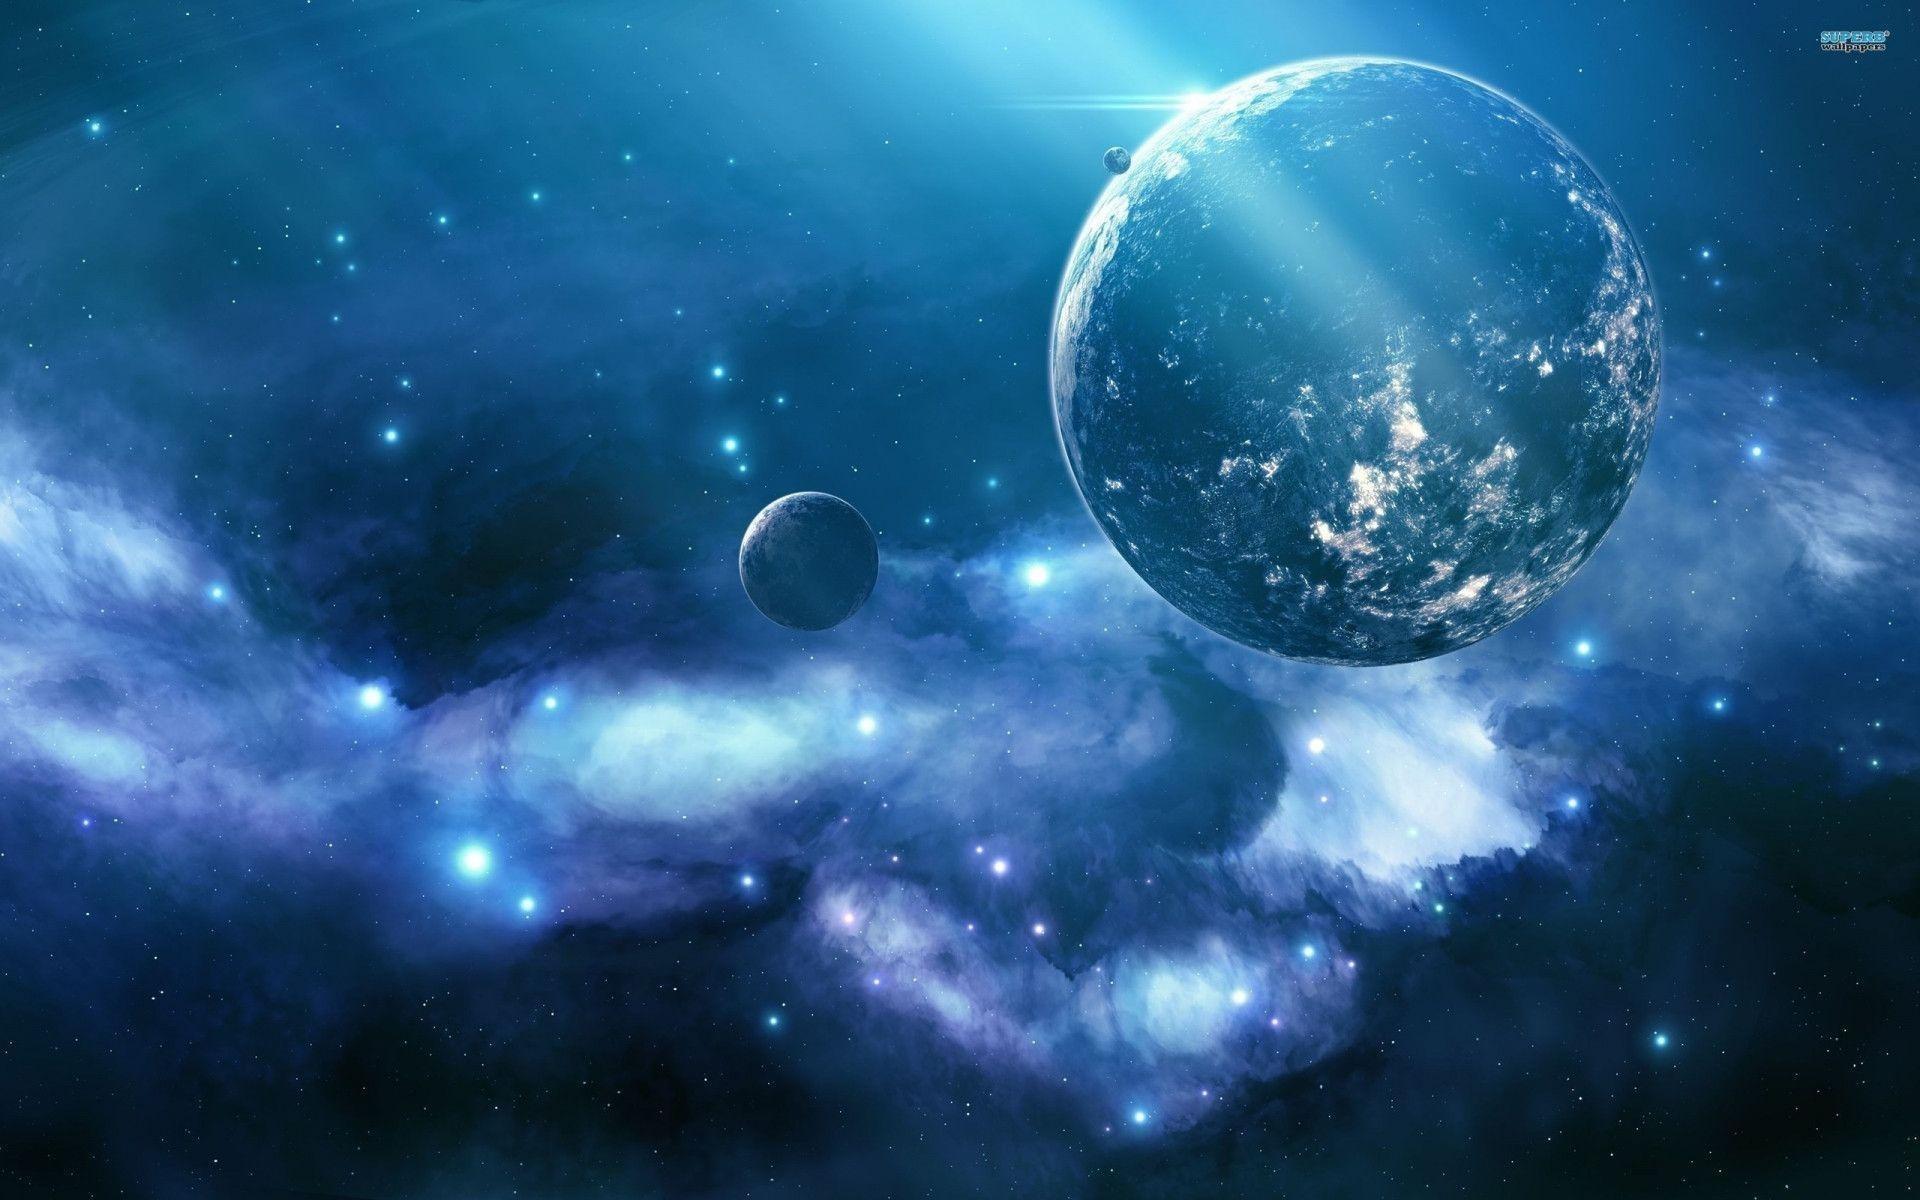 Space Wallpaper Hd wallpaper – 846935